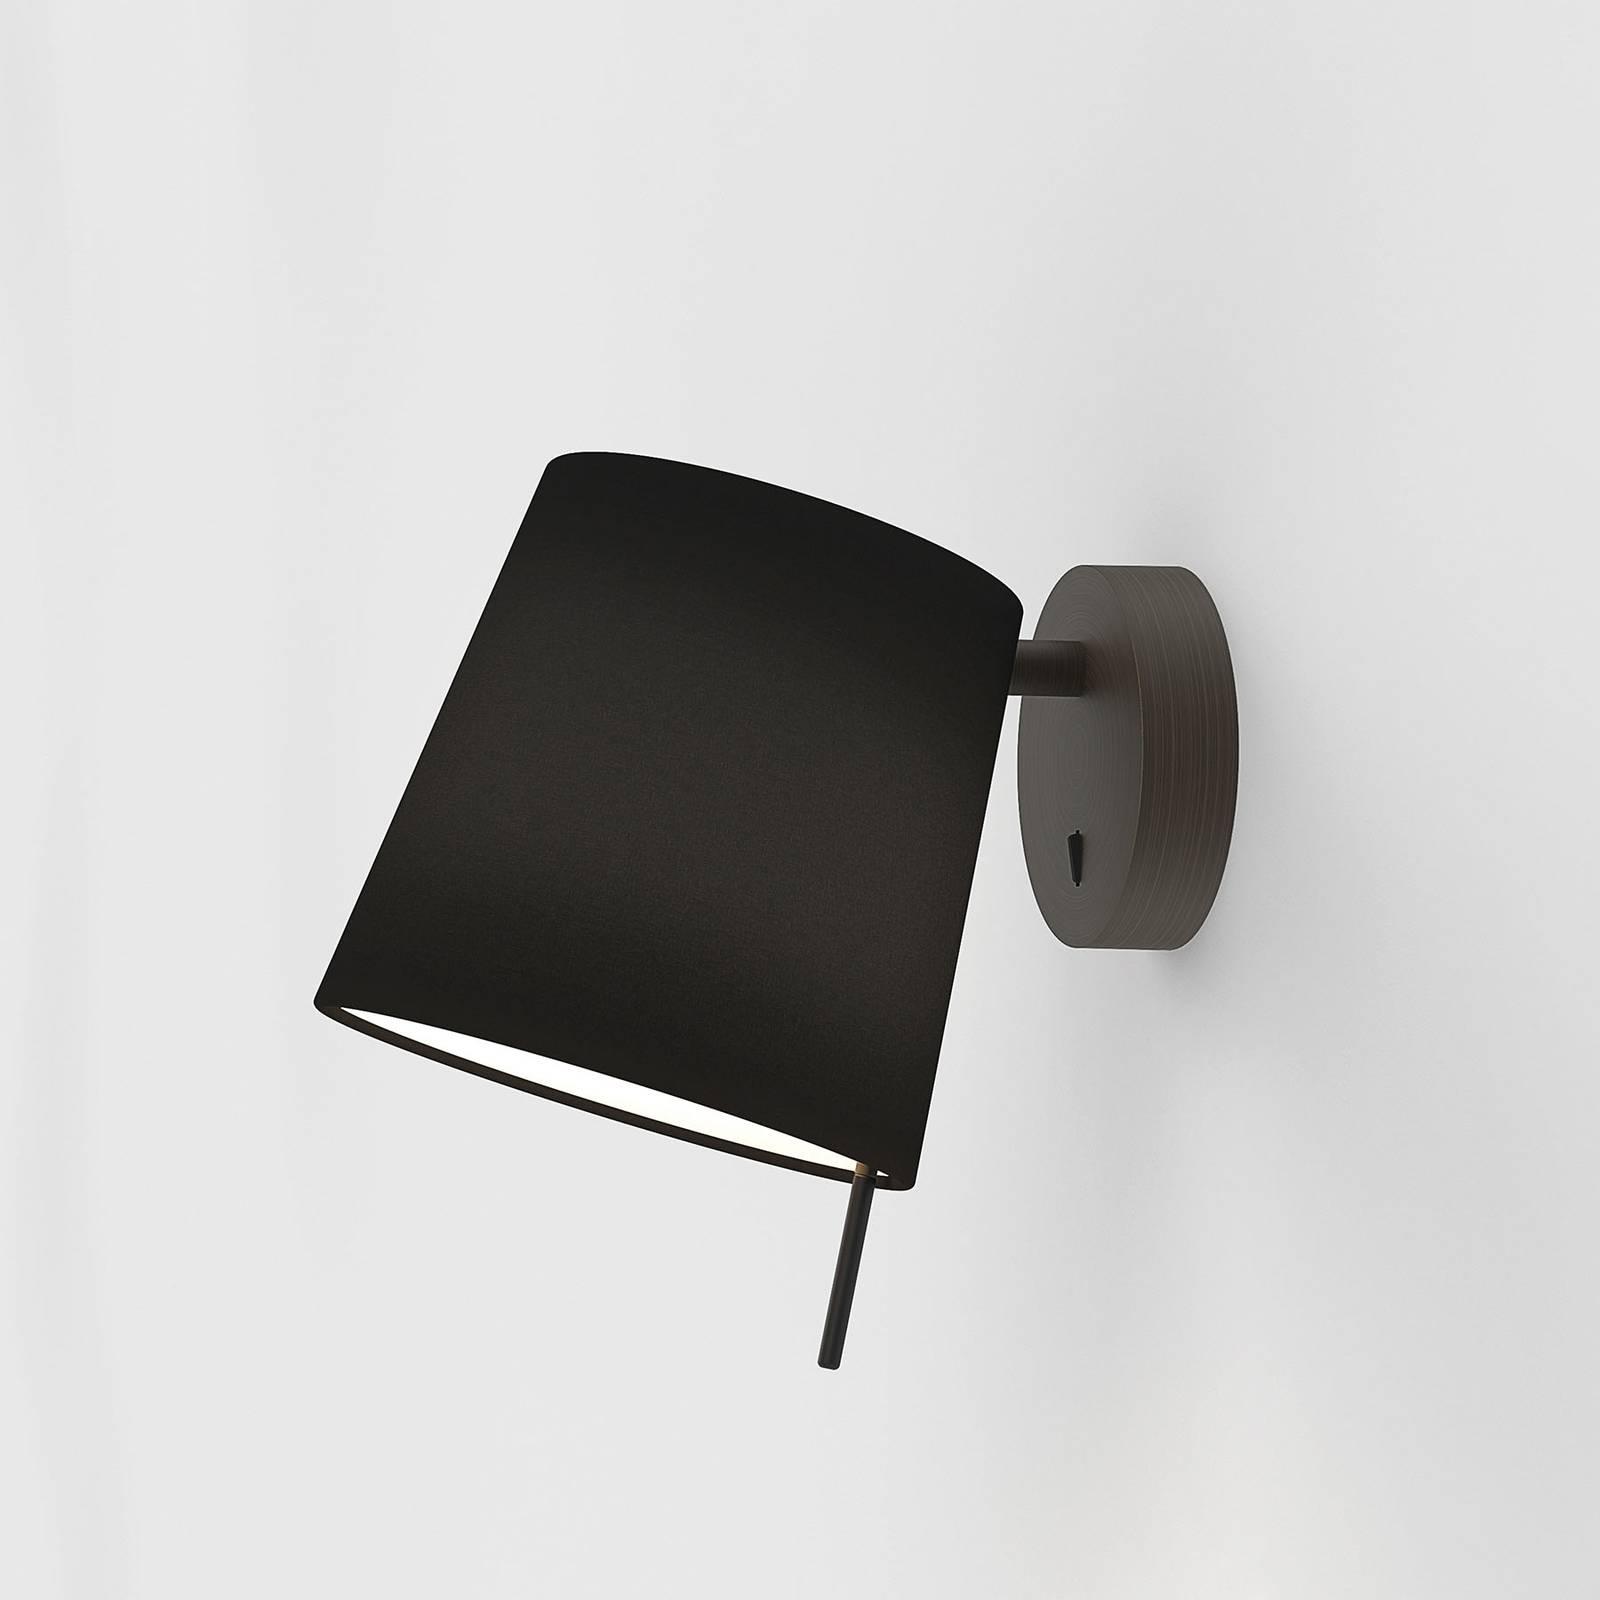 Astro Mitsu Wall -seinälamppu, pronssi, musta